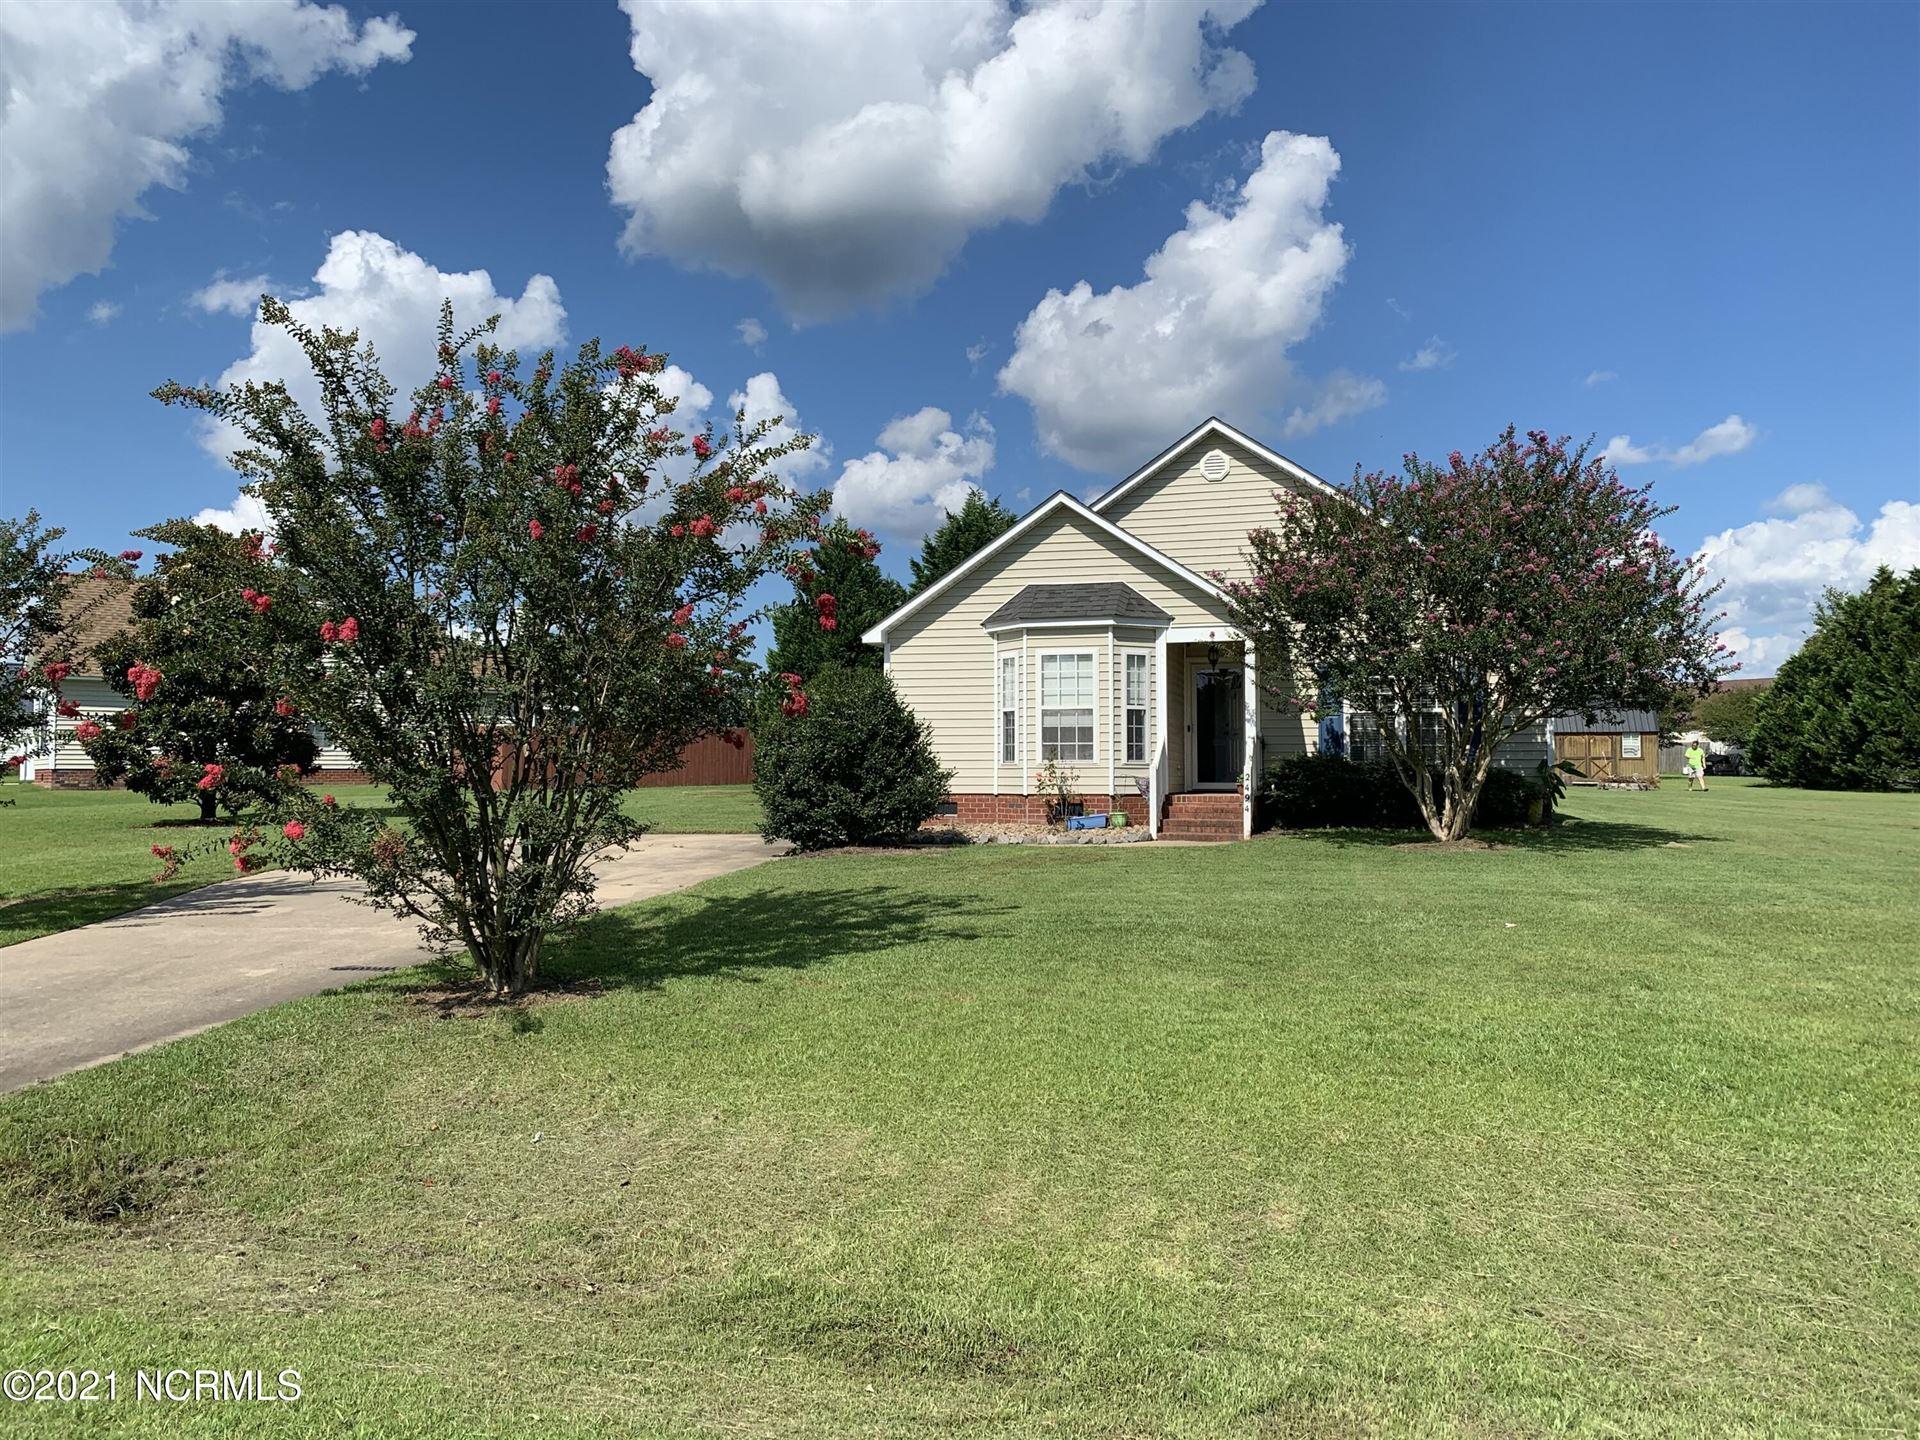 Photo of 2494 Beaver Creek Road, Greenville, NC 27834 (MLS # 100286965)